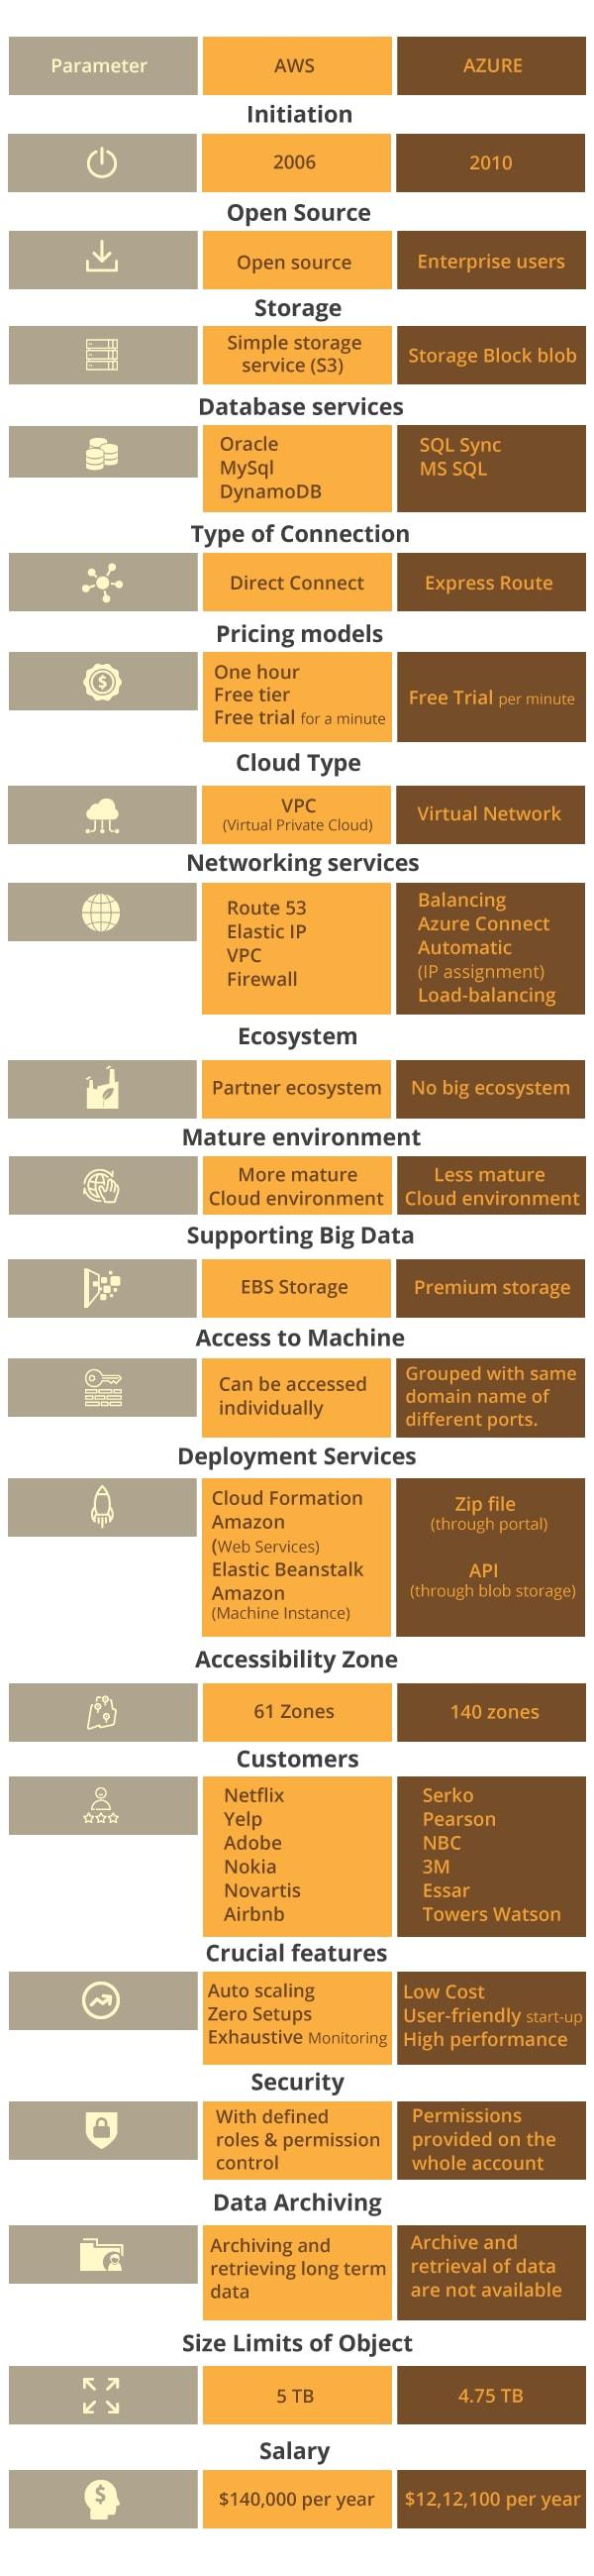 Comparison of AWS Vs Azure